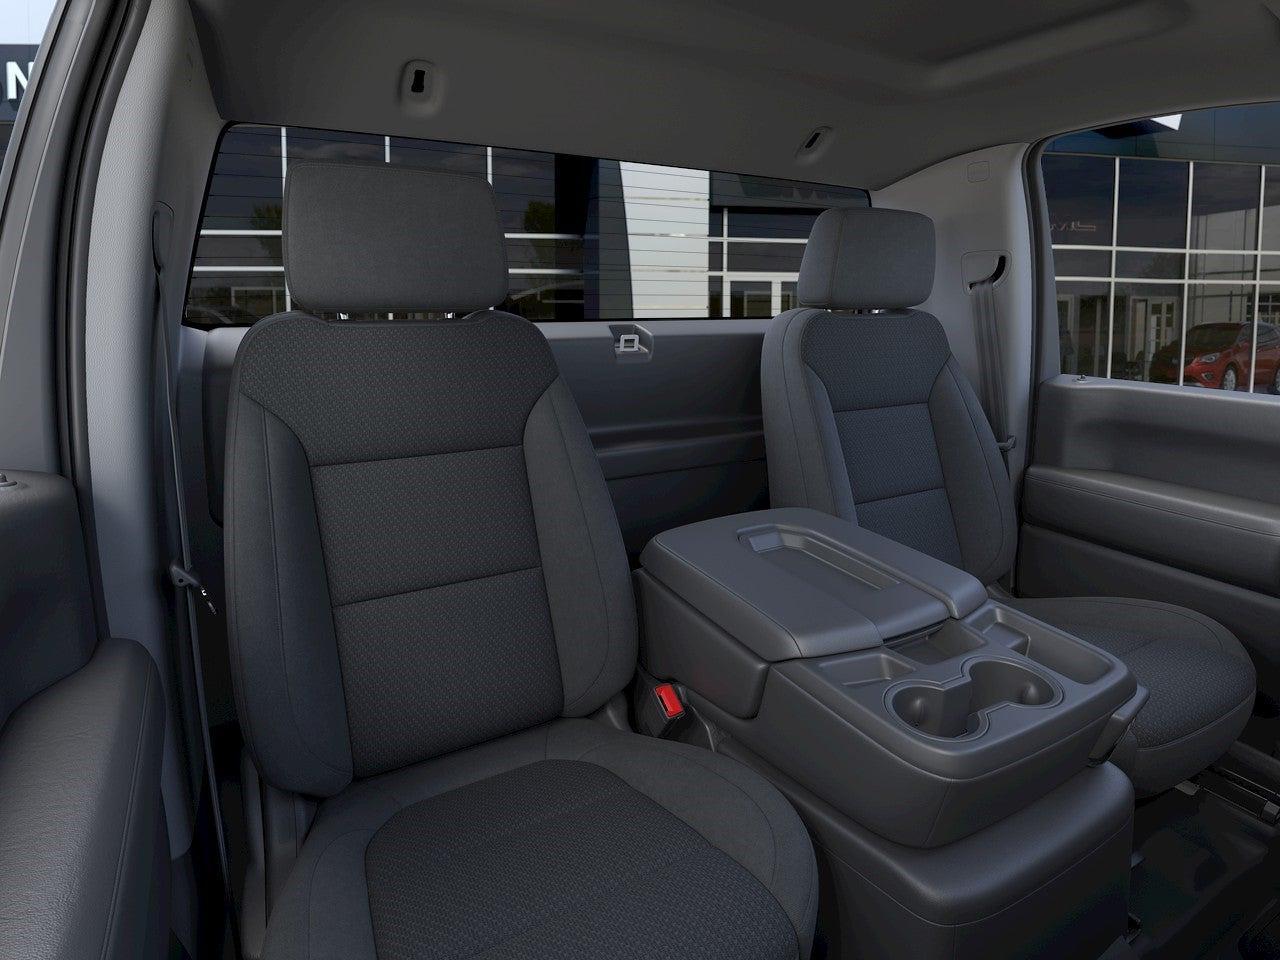 2021 GMC Sierra 3500 Regular Cab 4x4, Pickup #V21213 - photo 13